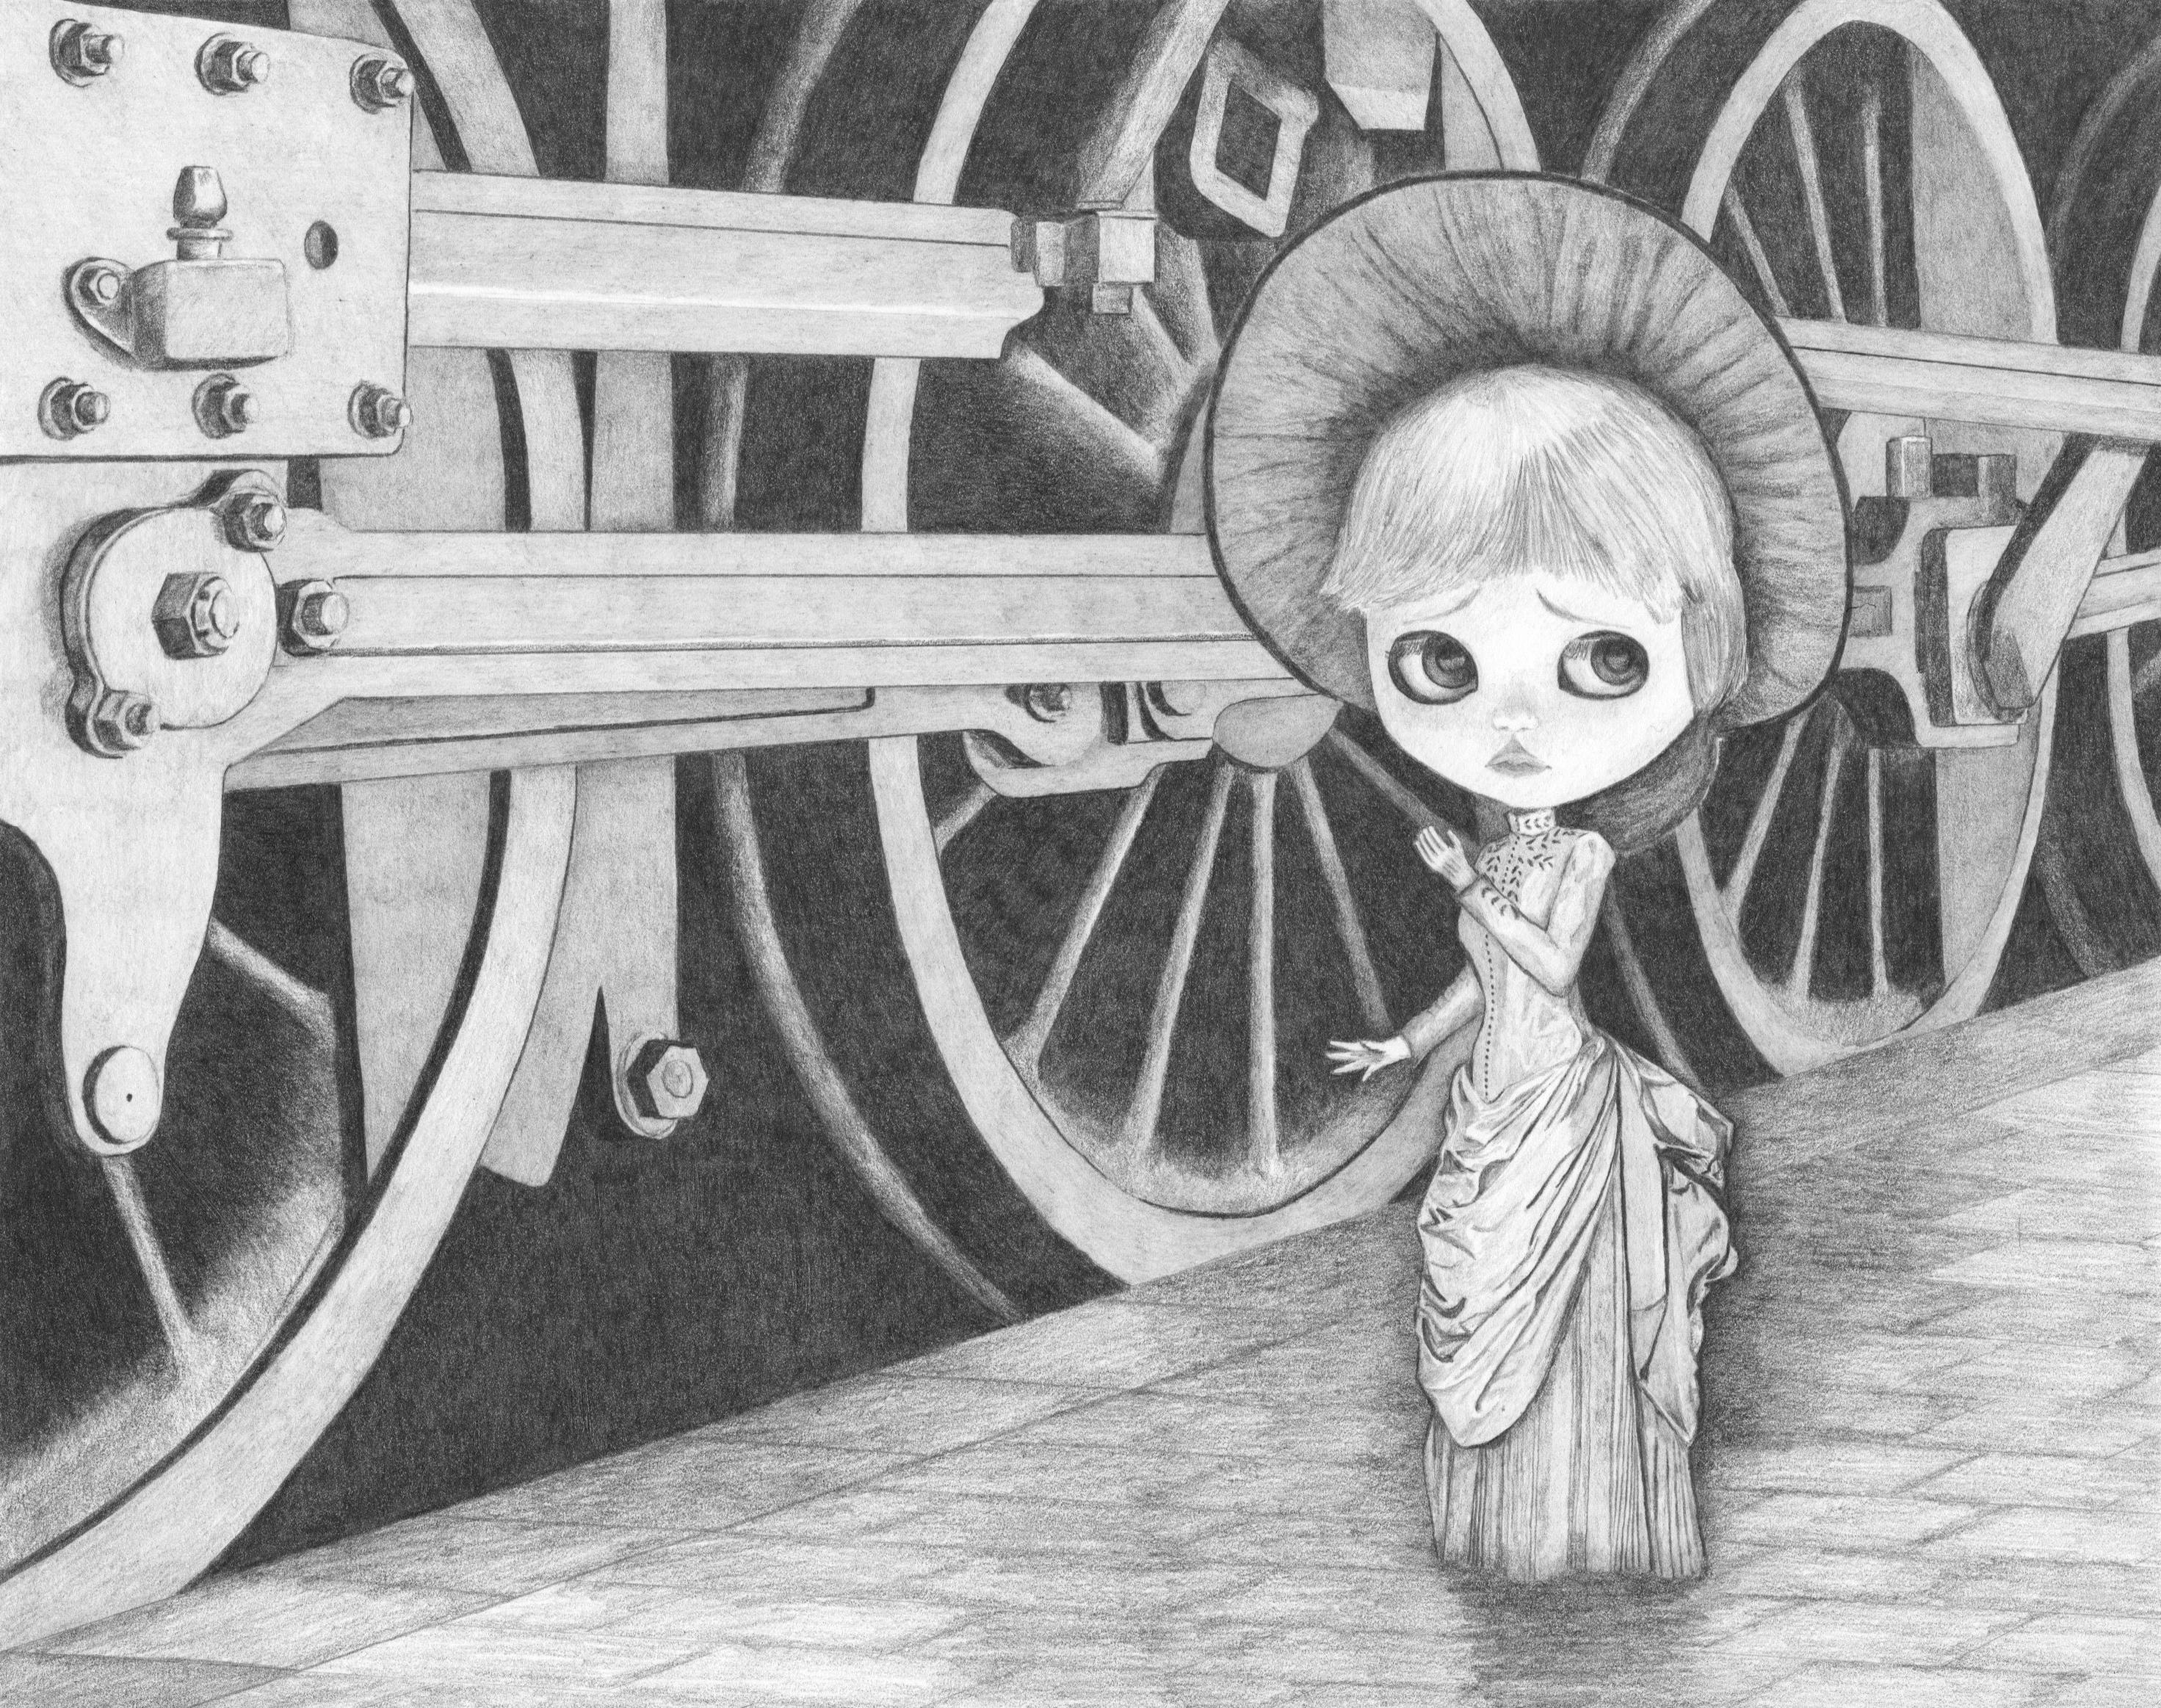 #31 - Anna Blythe Karenina